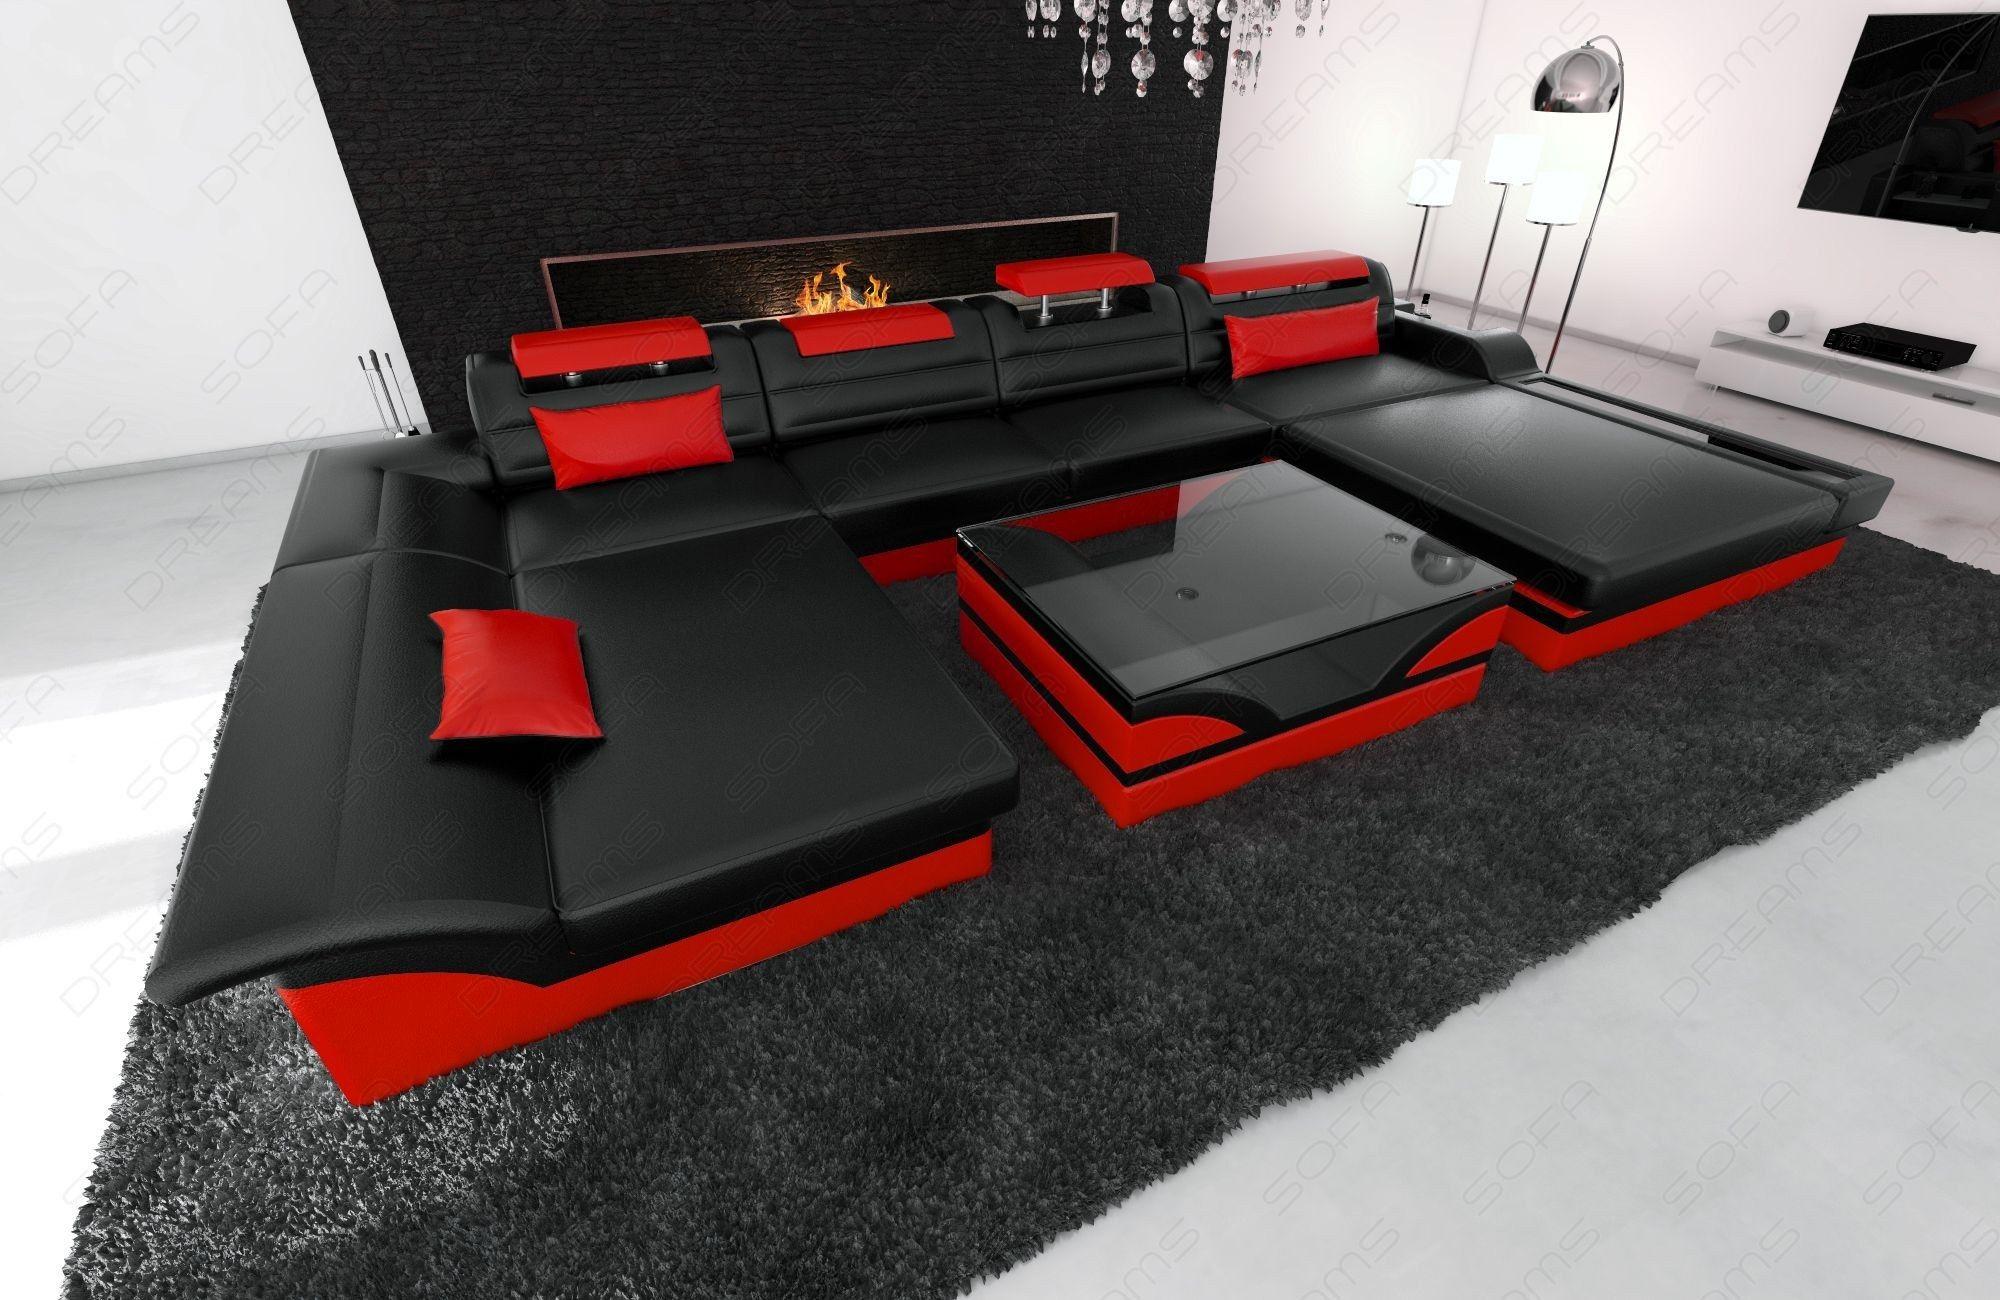 Design Sofa Chicago U Shape Black Red Modern Sofa Sectional Sectional Sofa Modern Fabric Sofa